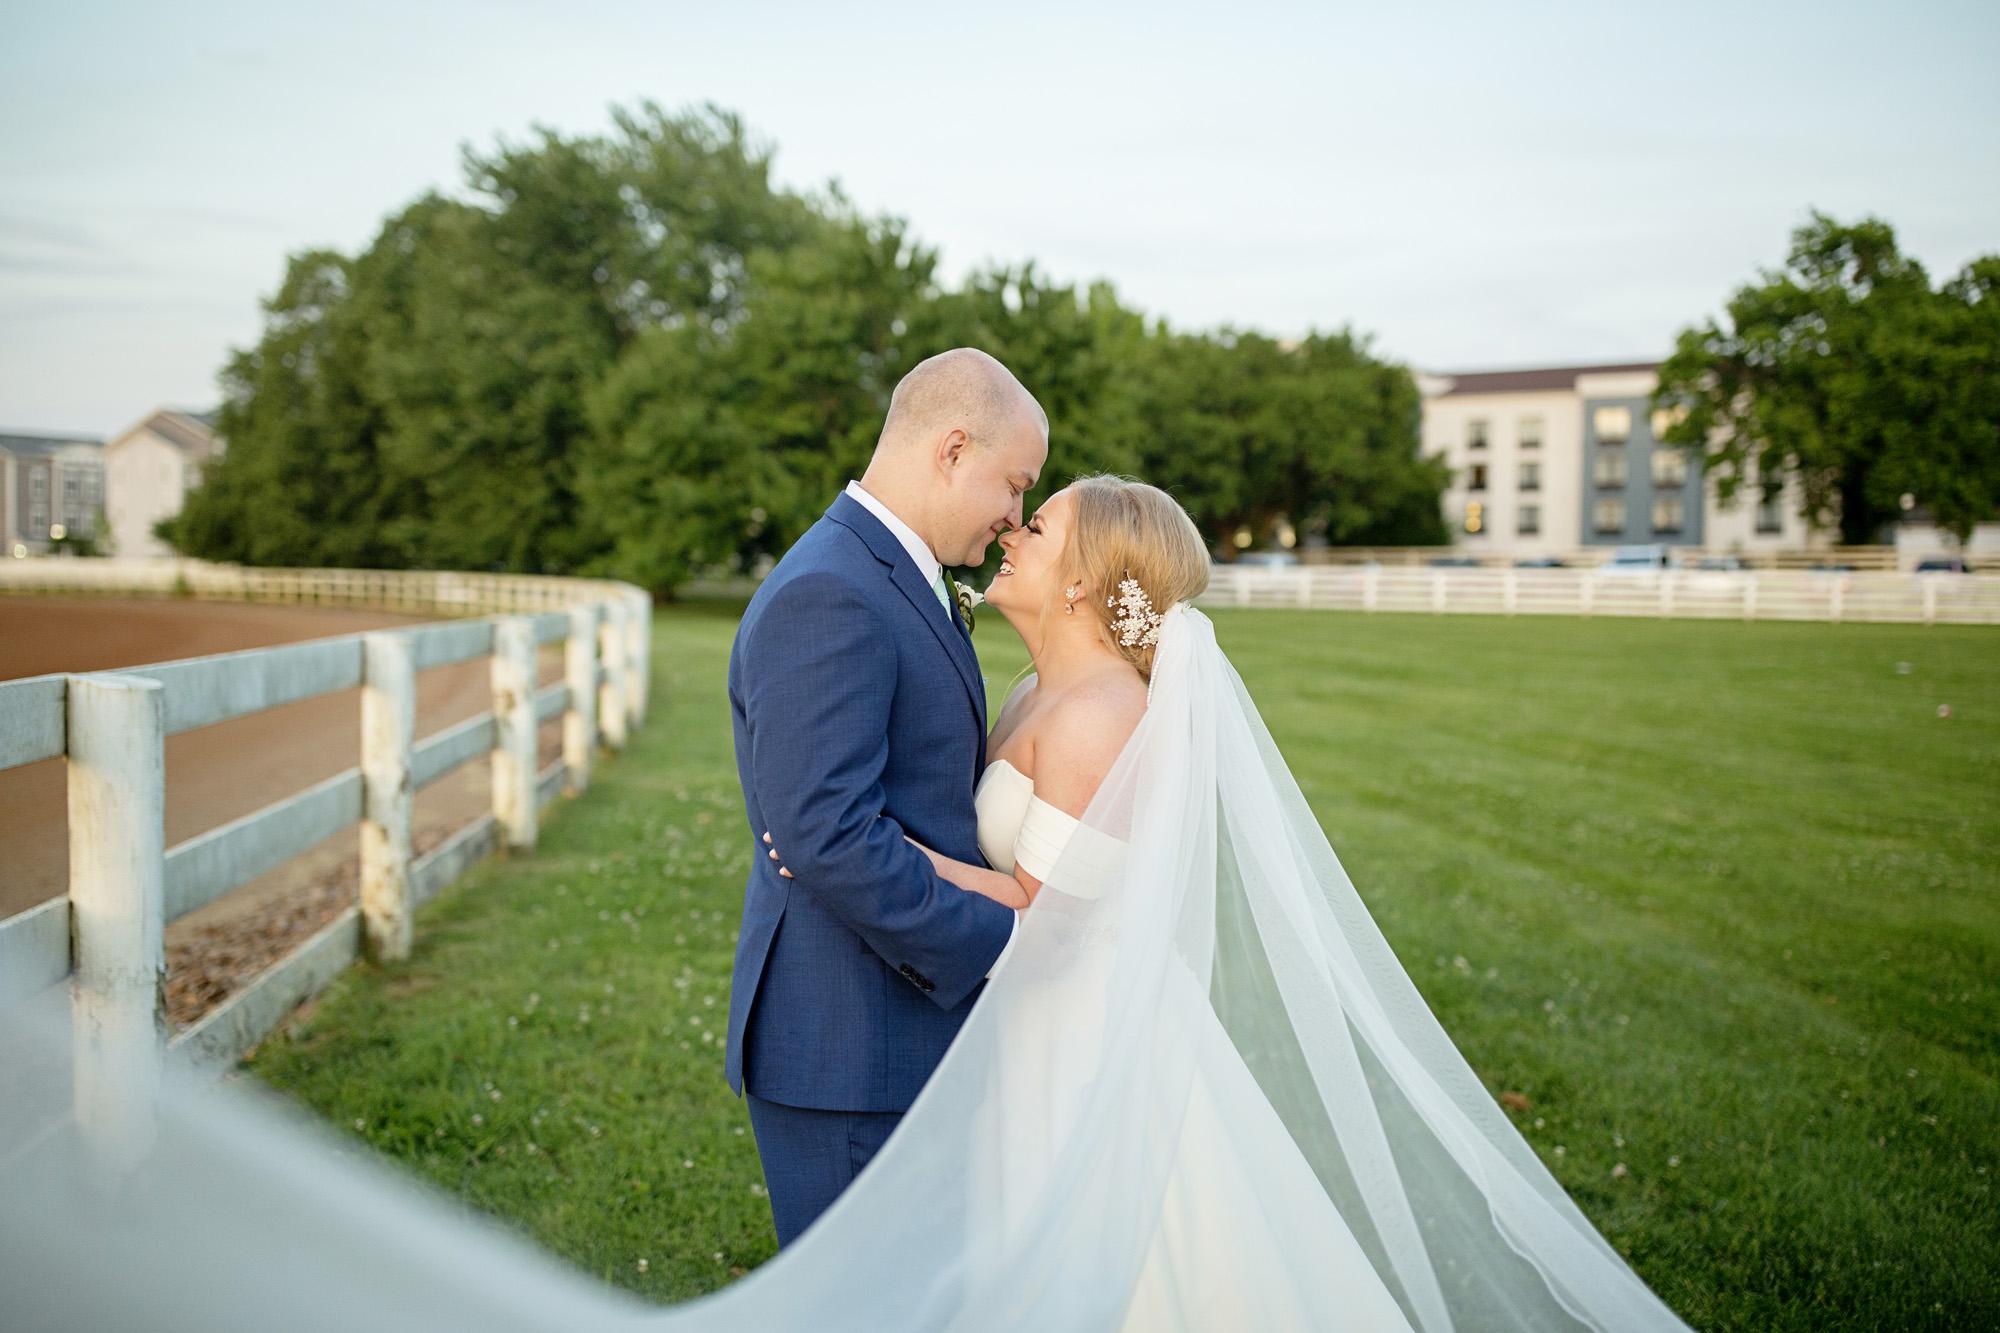 Seriously_Sabrina_Photography_Lexington_Kentucky_Pax_Christi_Round_Barn_Wedding_Beath_75.jpg